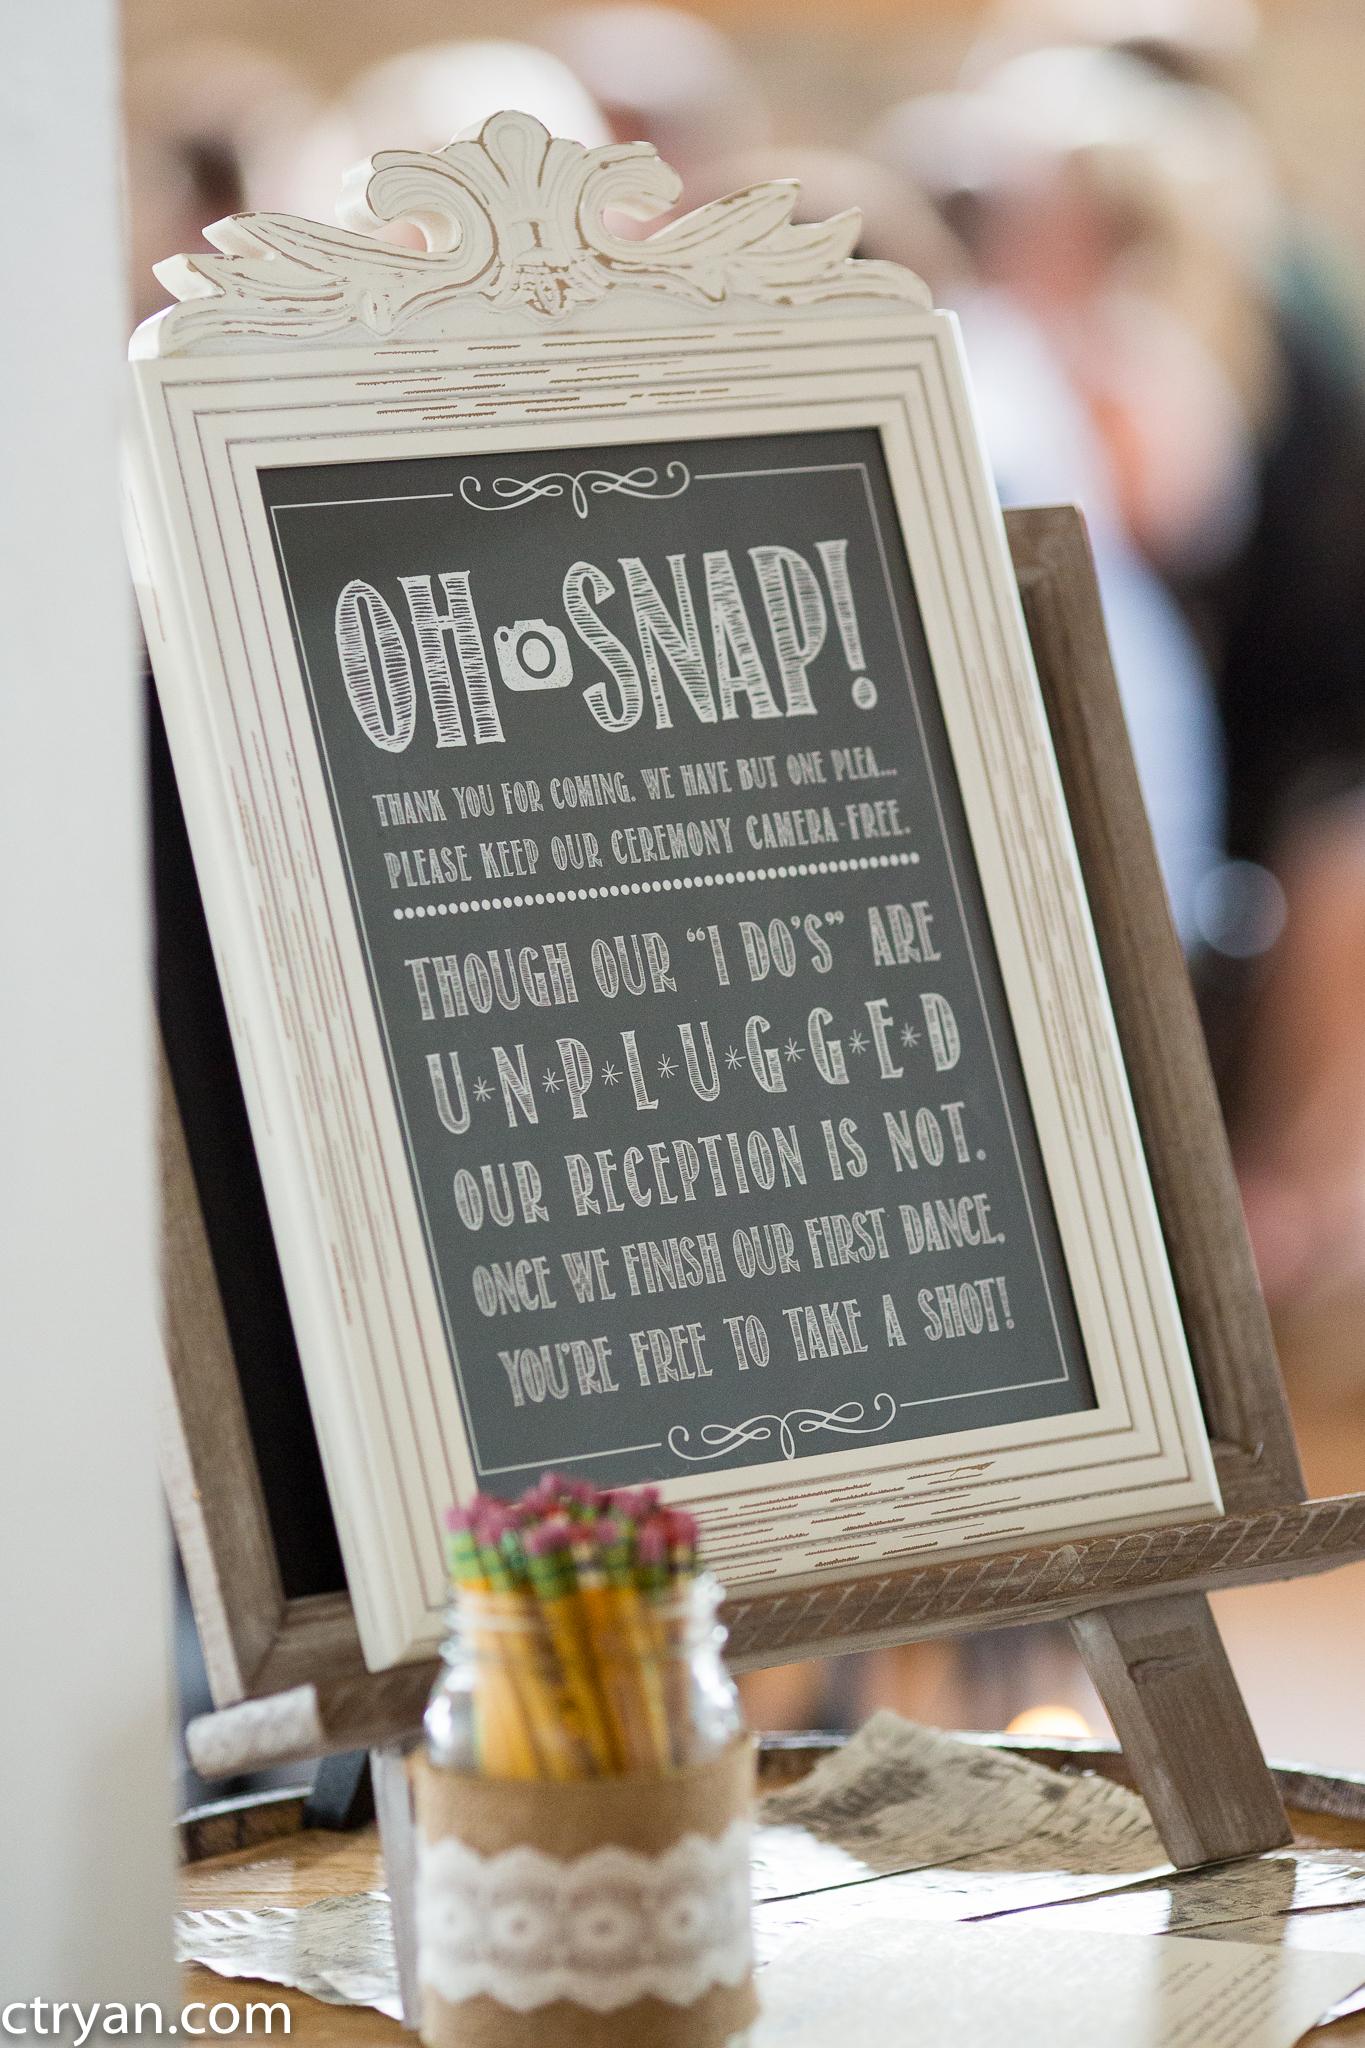 Acowsay_Minnesota_Wedding_Sign.jpg